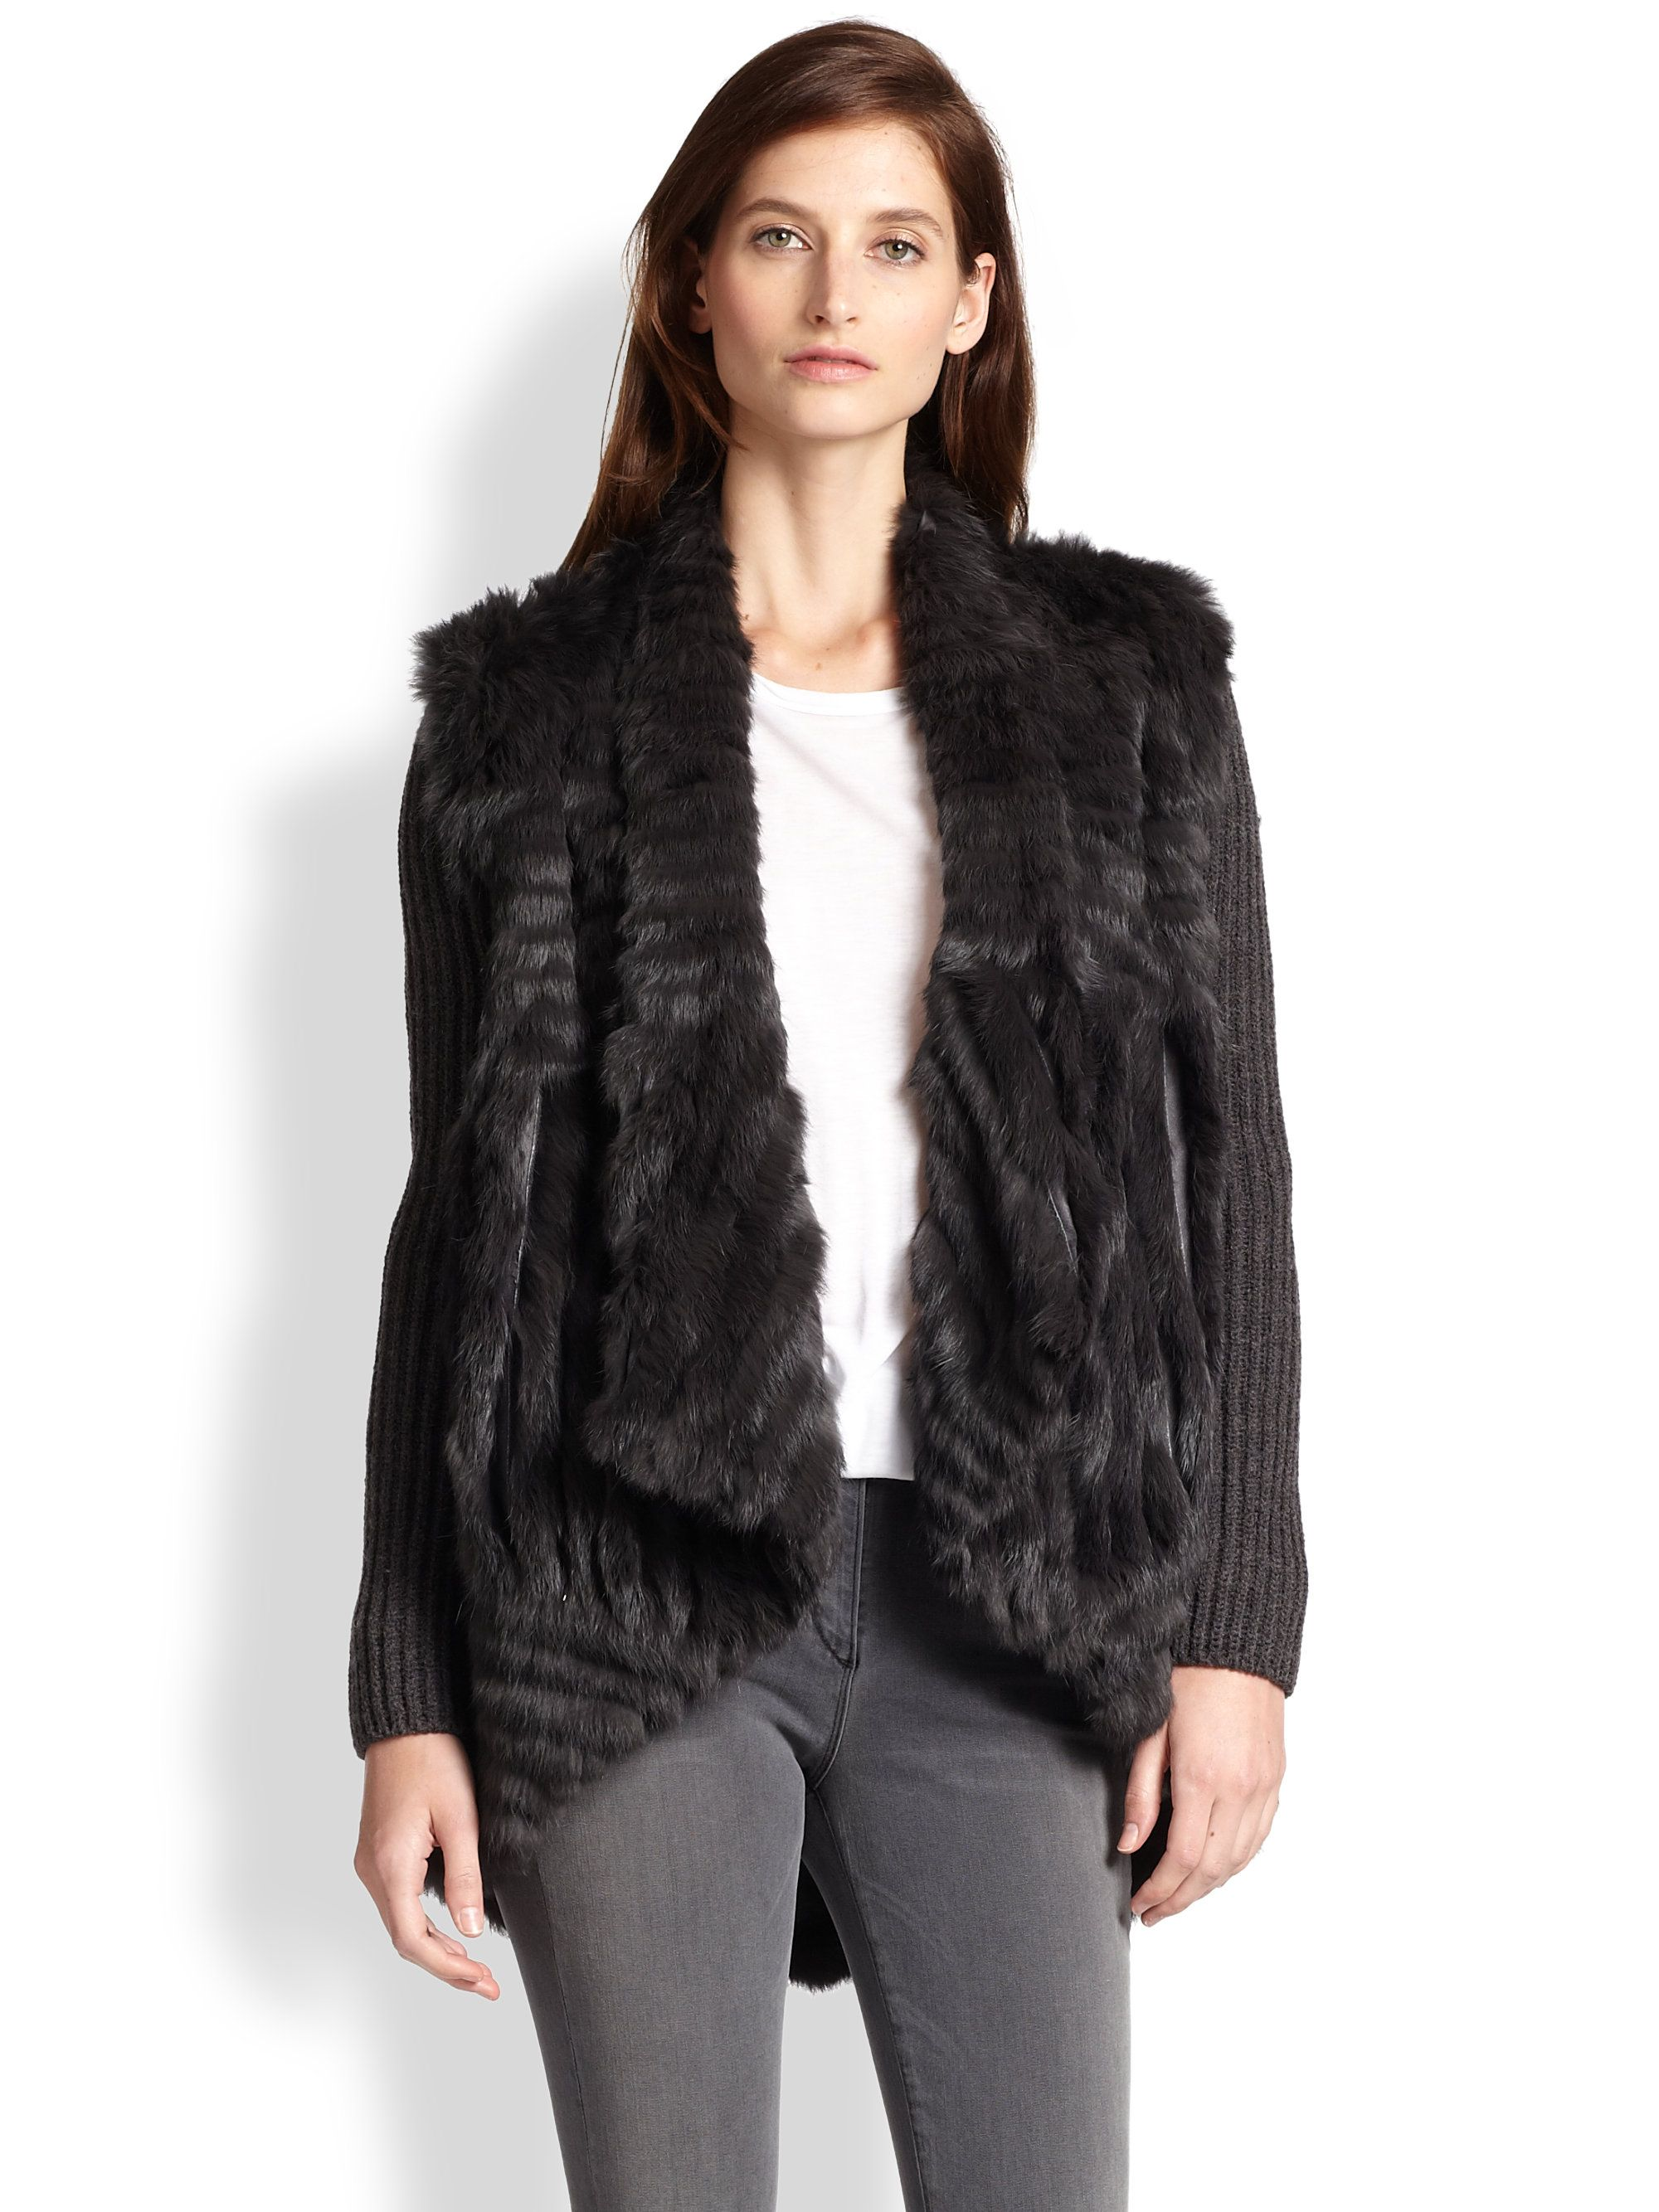 ea954cc6714f53 Haute hippie Detachable Knit-Sleeved Rabbit Fur Jacket in Black (GRAPHITE)  | Lyst